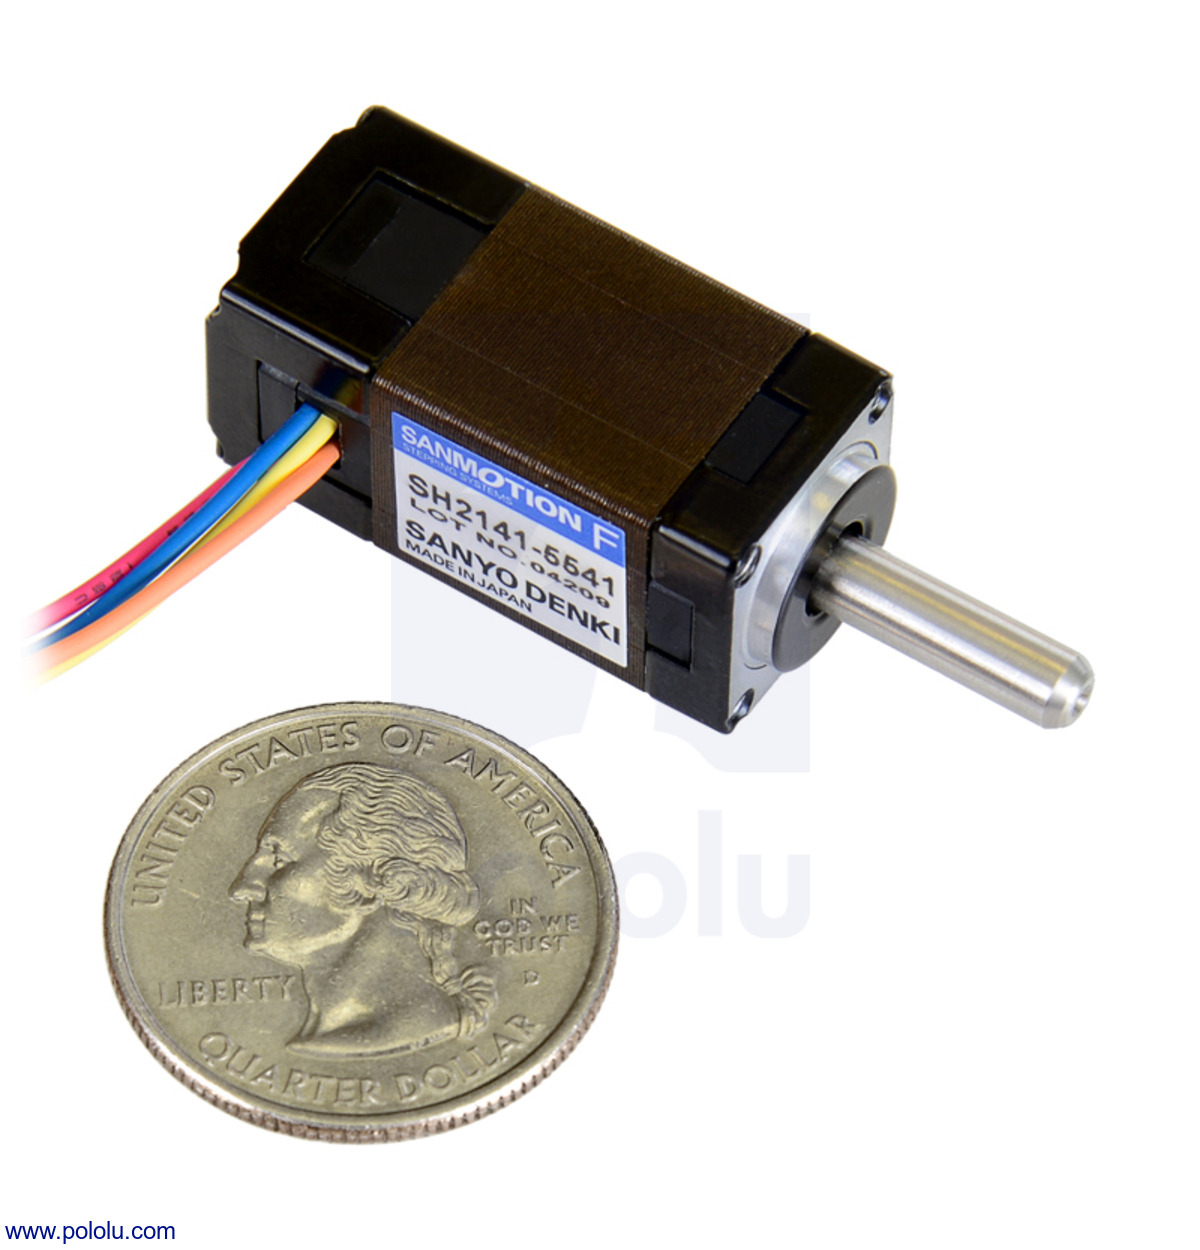 Pololu Sanyo Miniature Stepper Motor Bipolar 200 Steps Rev 14 Mini Cnc Controller Wiring Diagram New